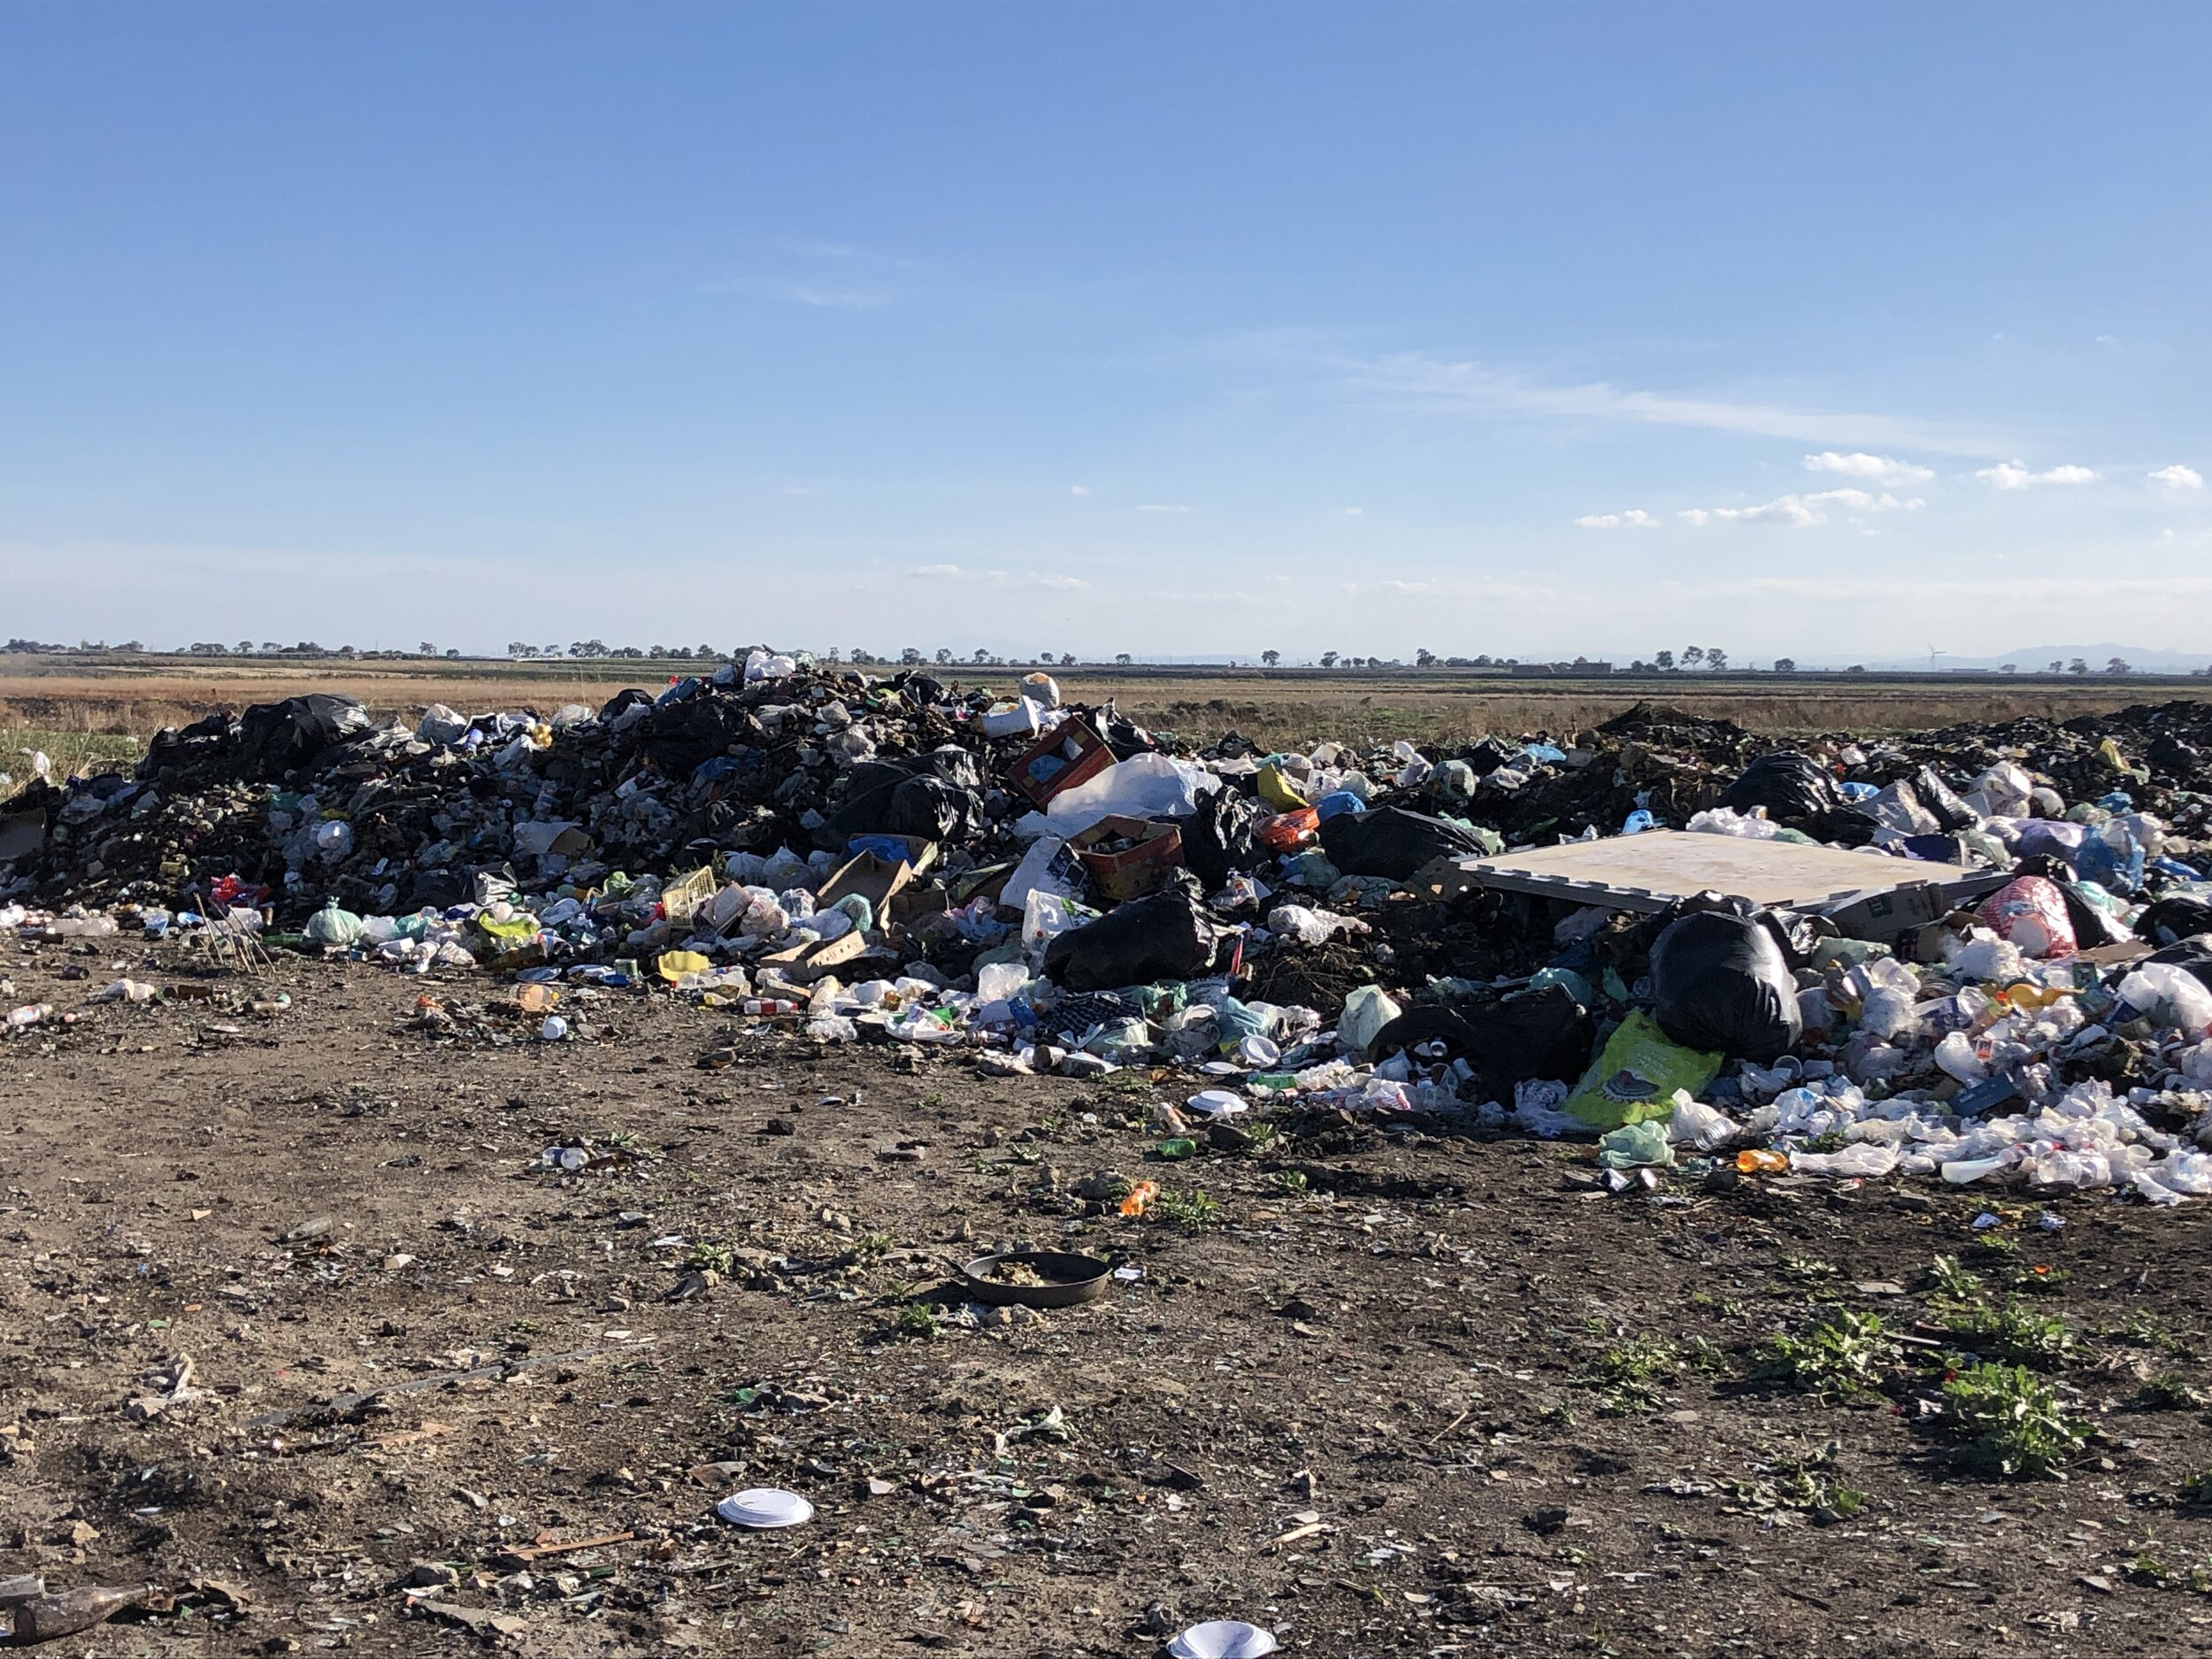 The trash heap behind the ghetto. Foggia, Italy. 8 October 2019. ©Pamela Kerpius